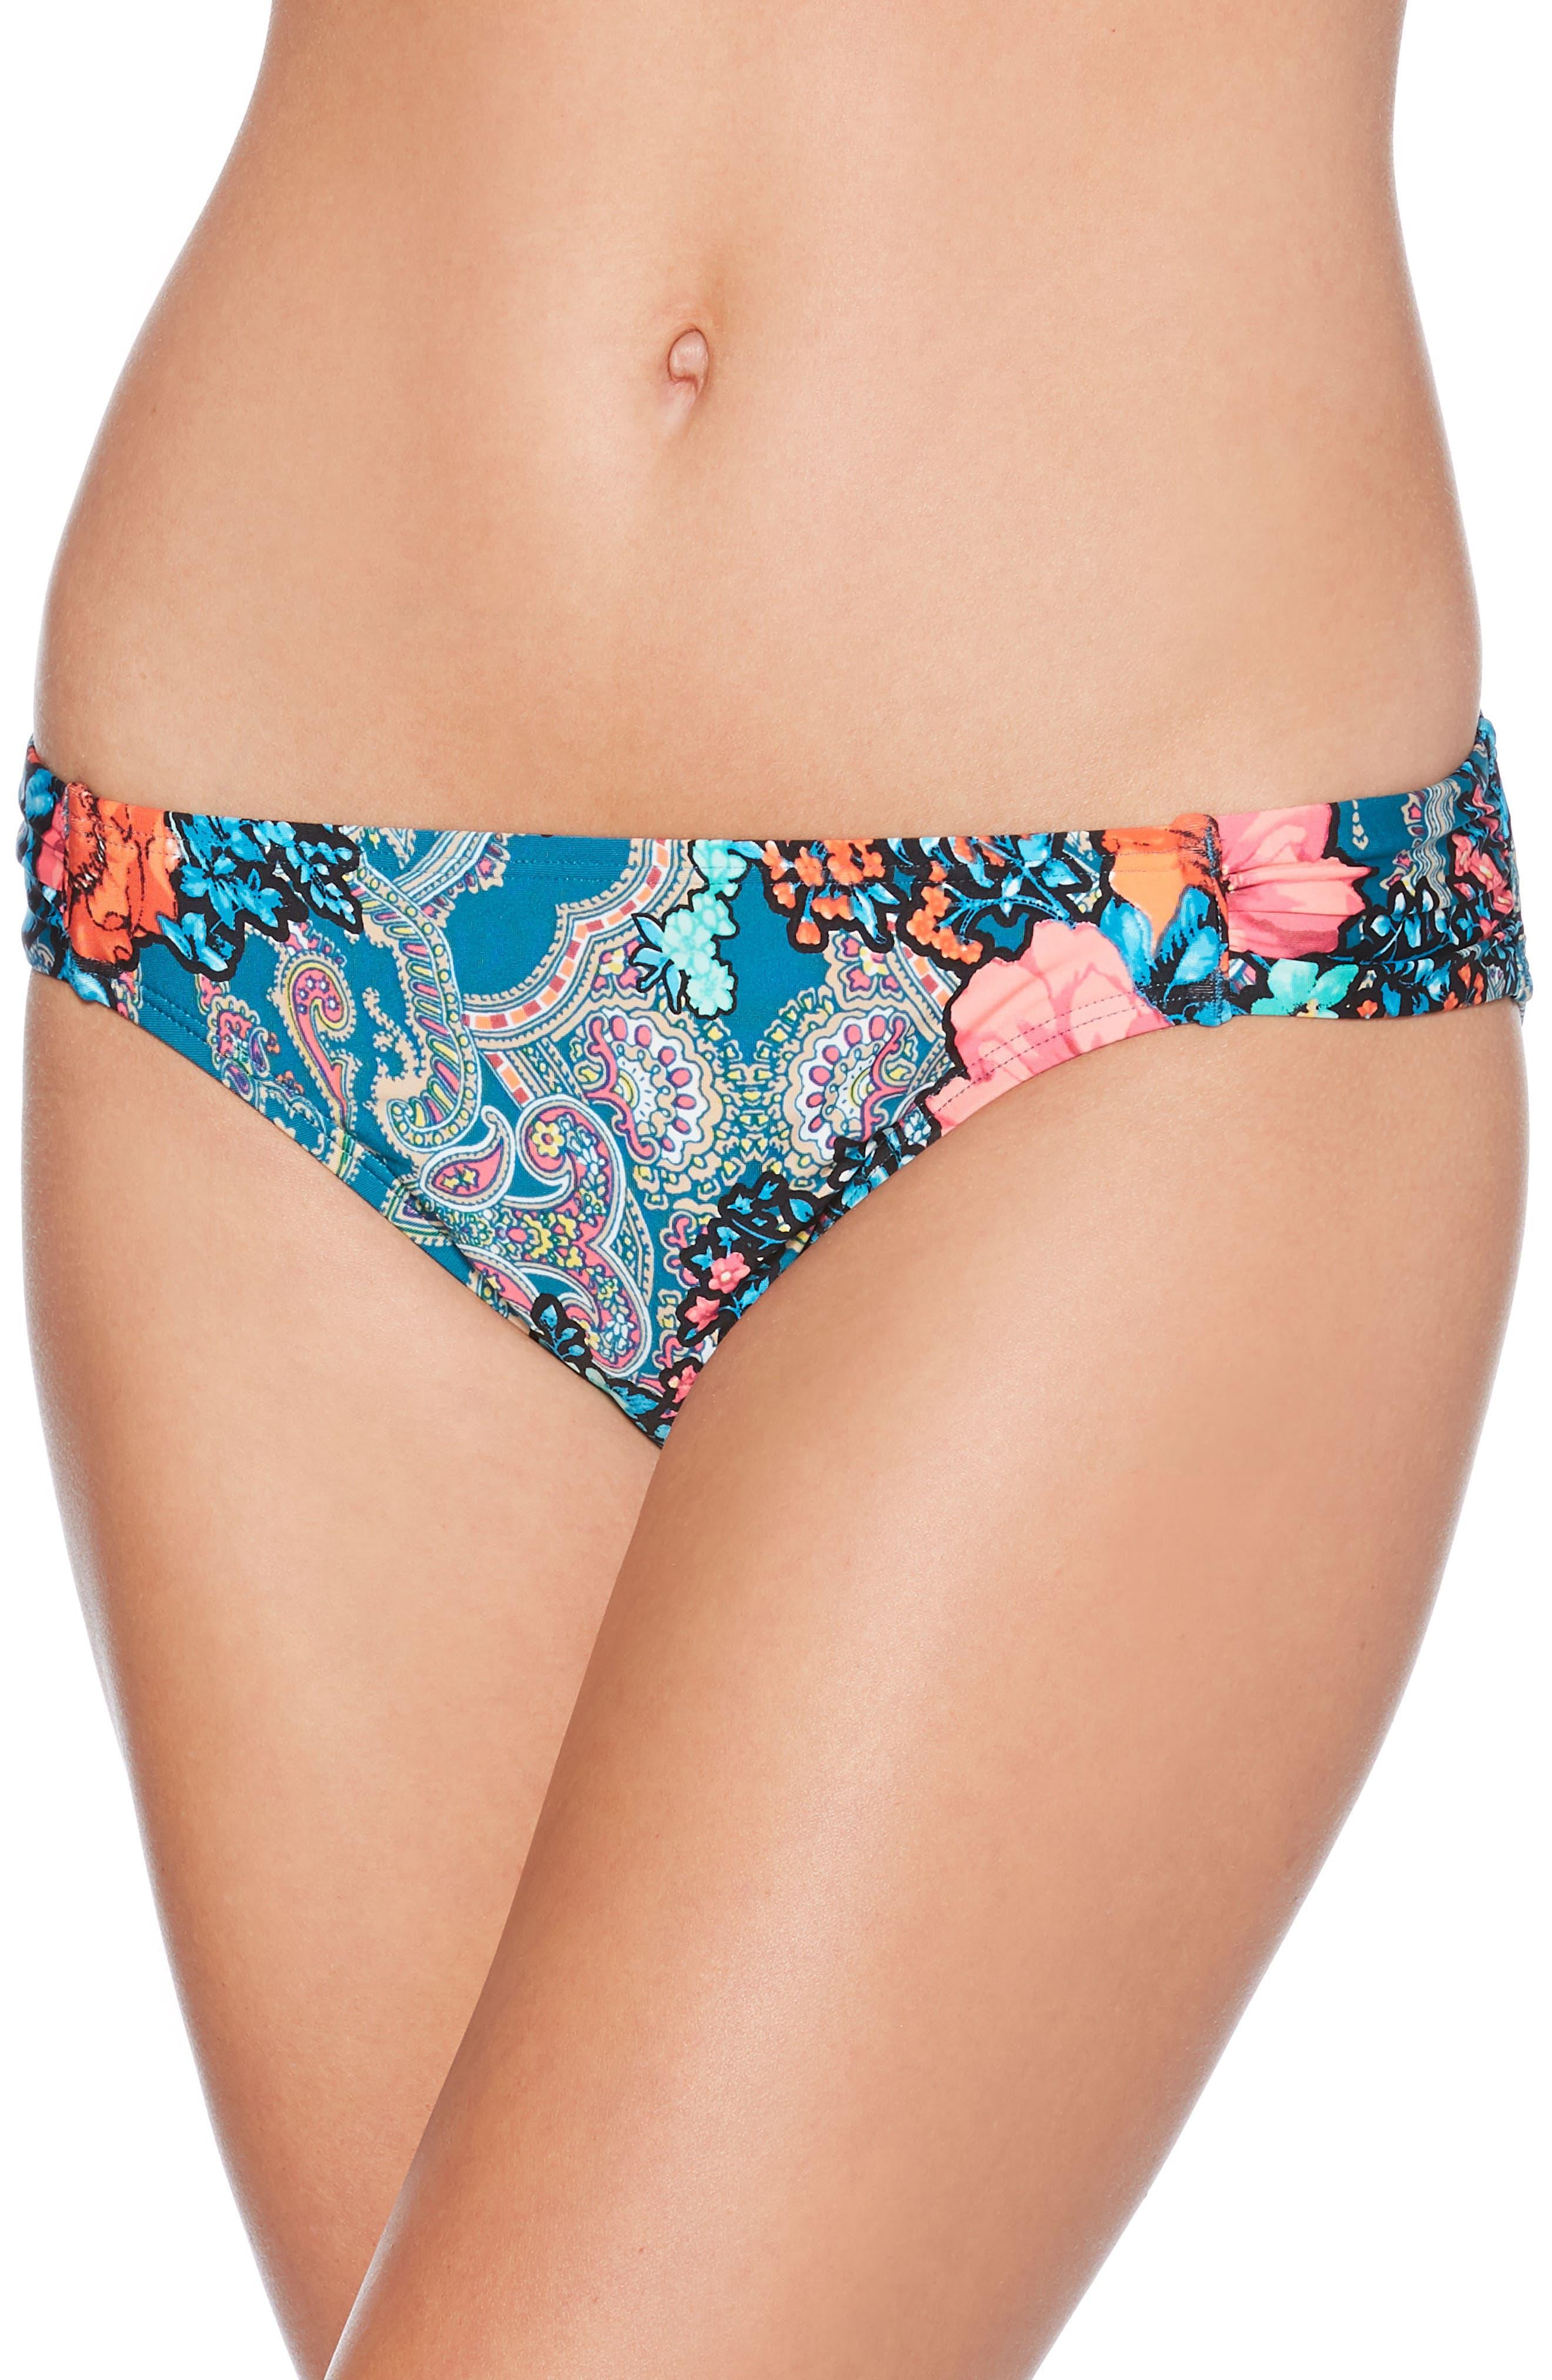 Floral Paisley Hipster Bikini Bottoms,                             Main thumbnail 1, color,                             440